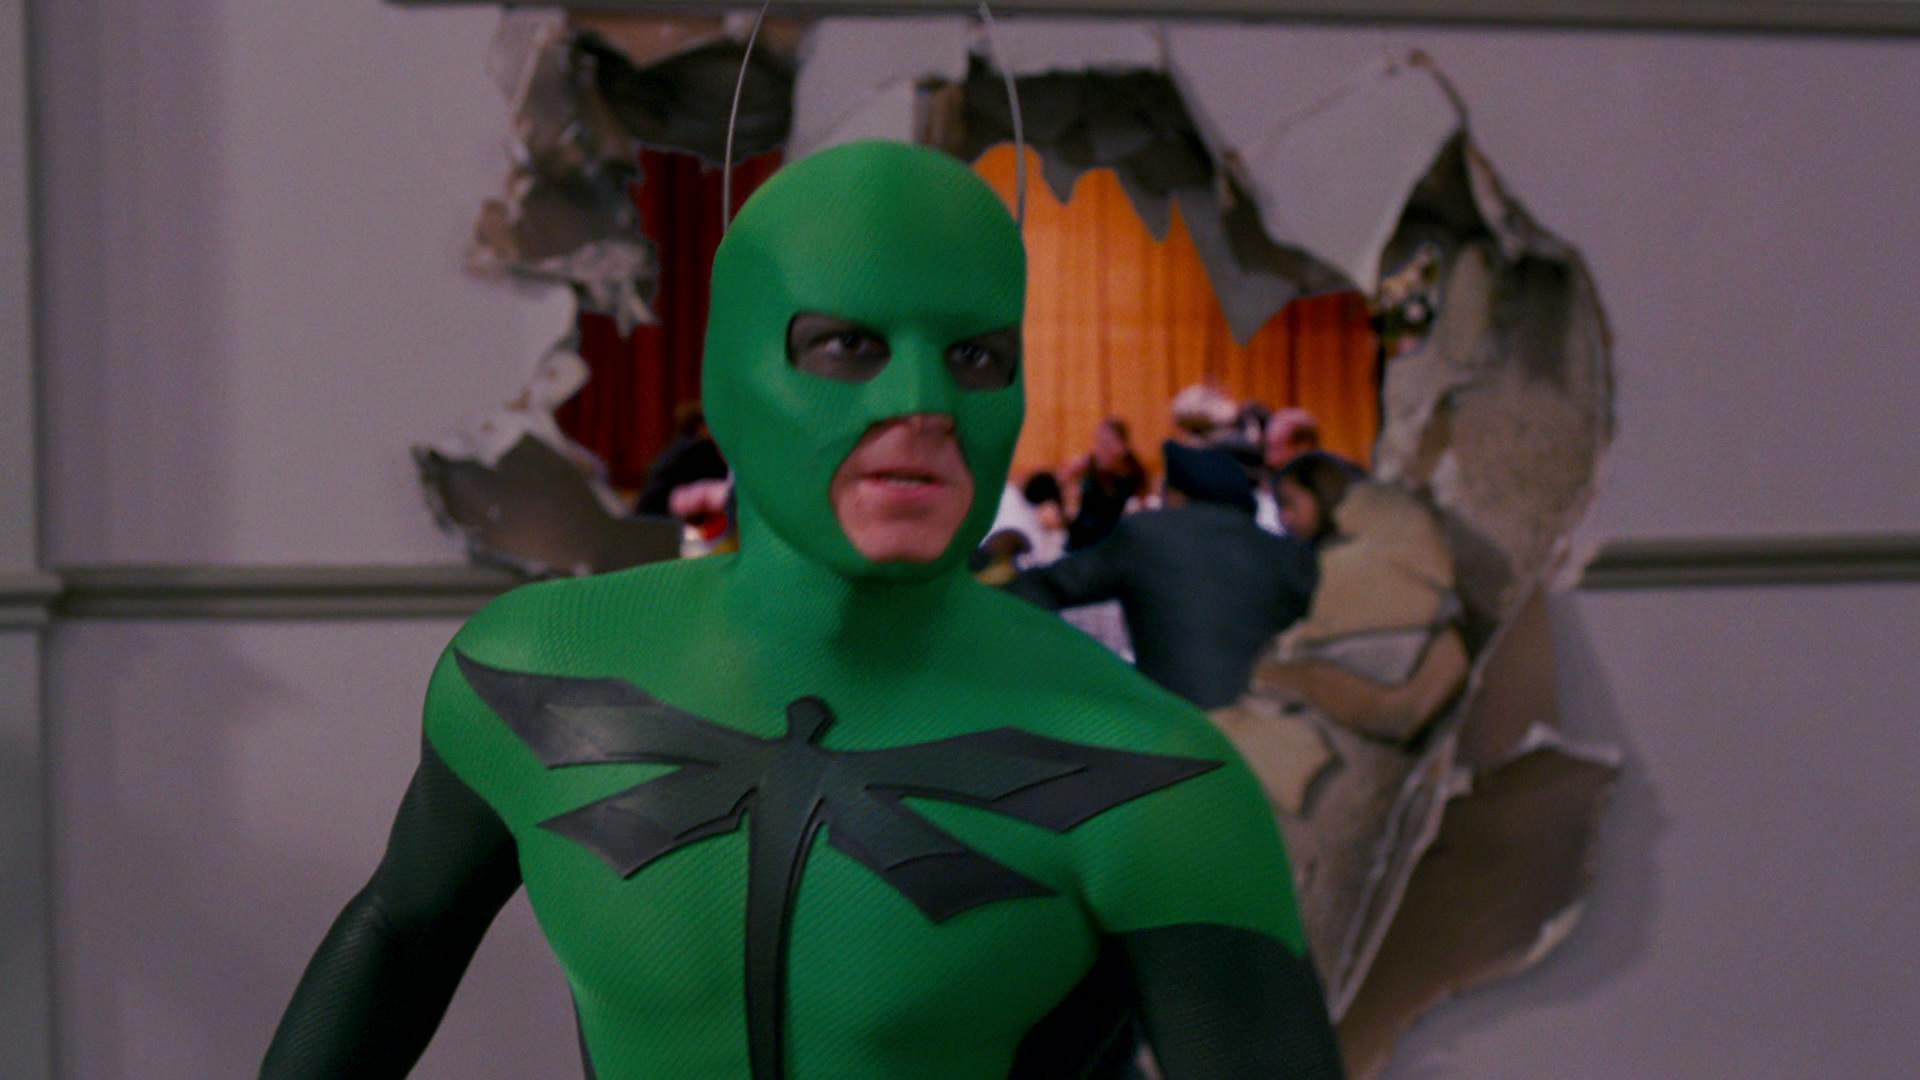 sc 1 st  DVD Talk & Superhero Movie (Blu-ray) : DVD Talk Review of the Blu-ray